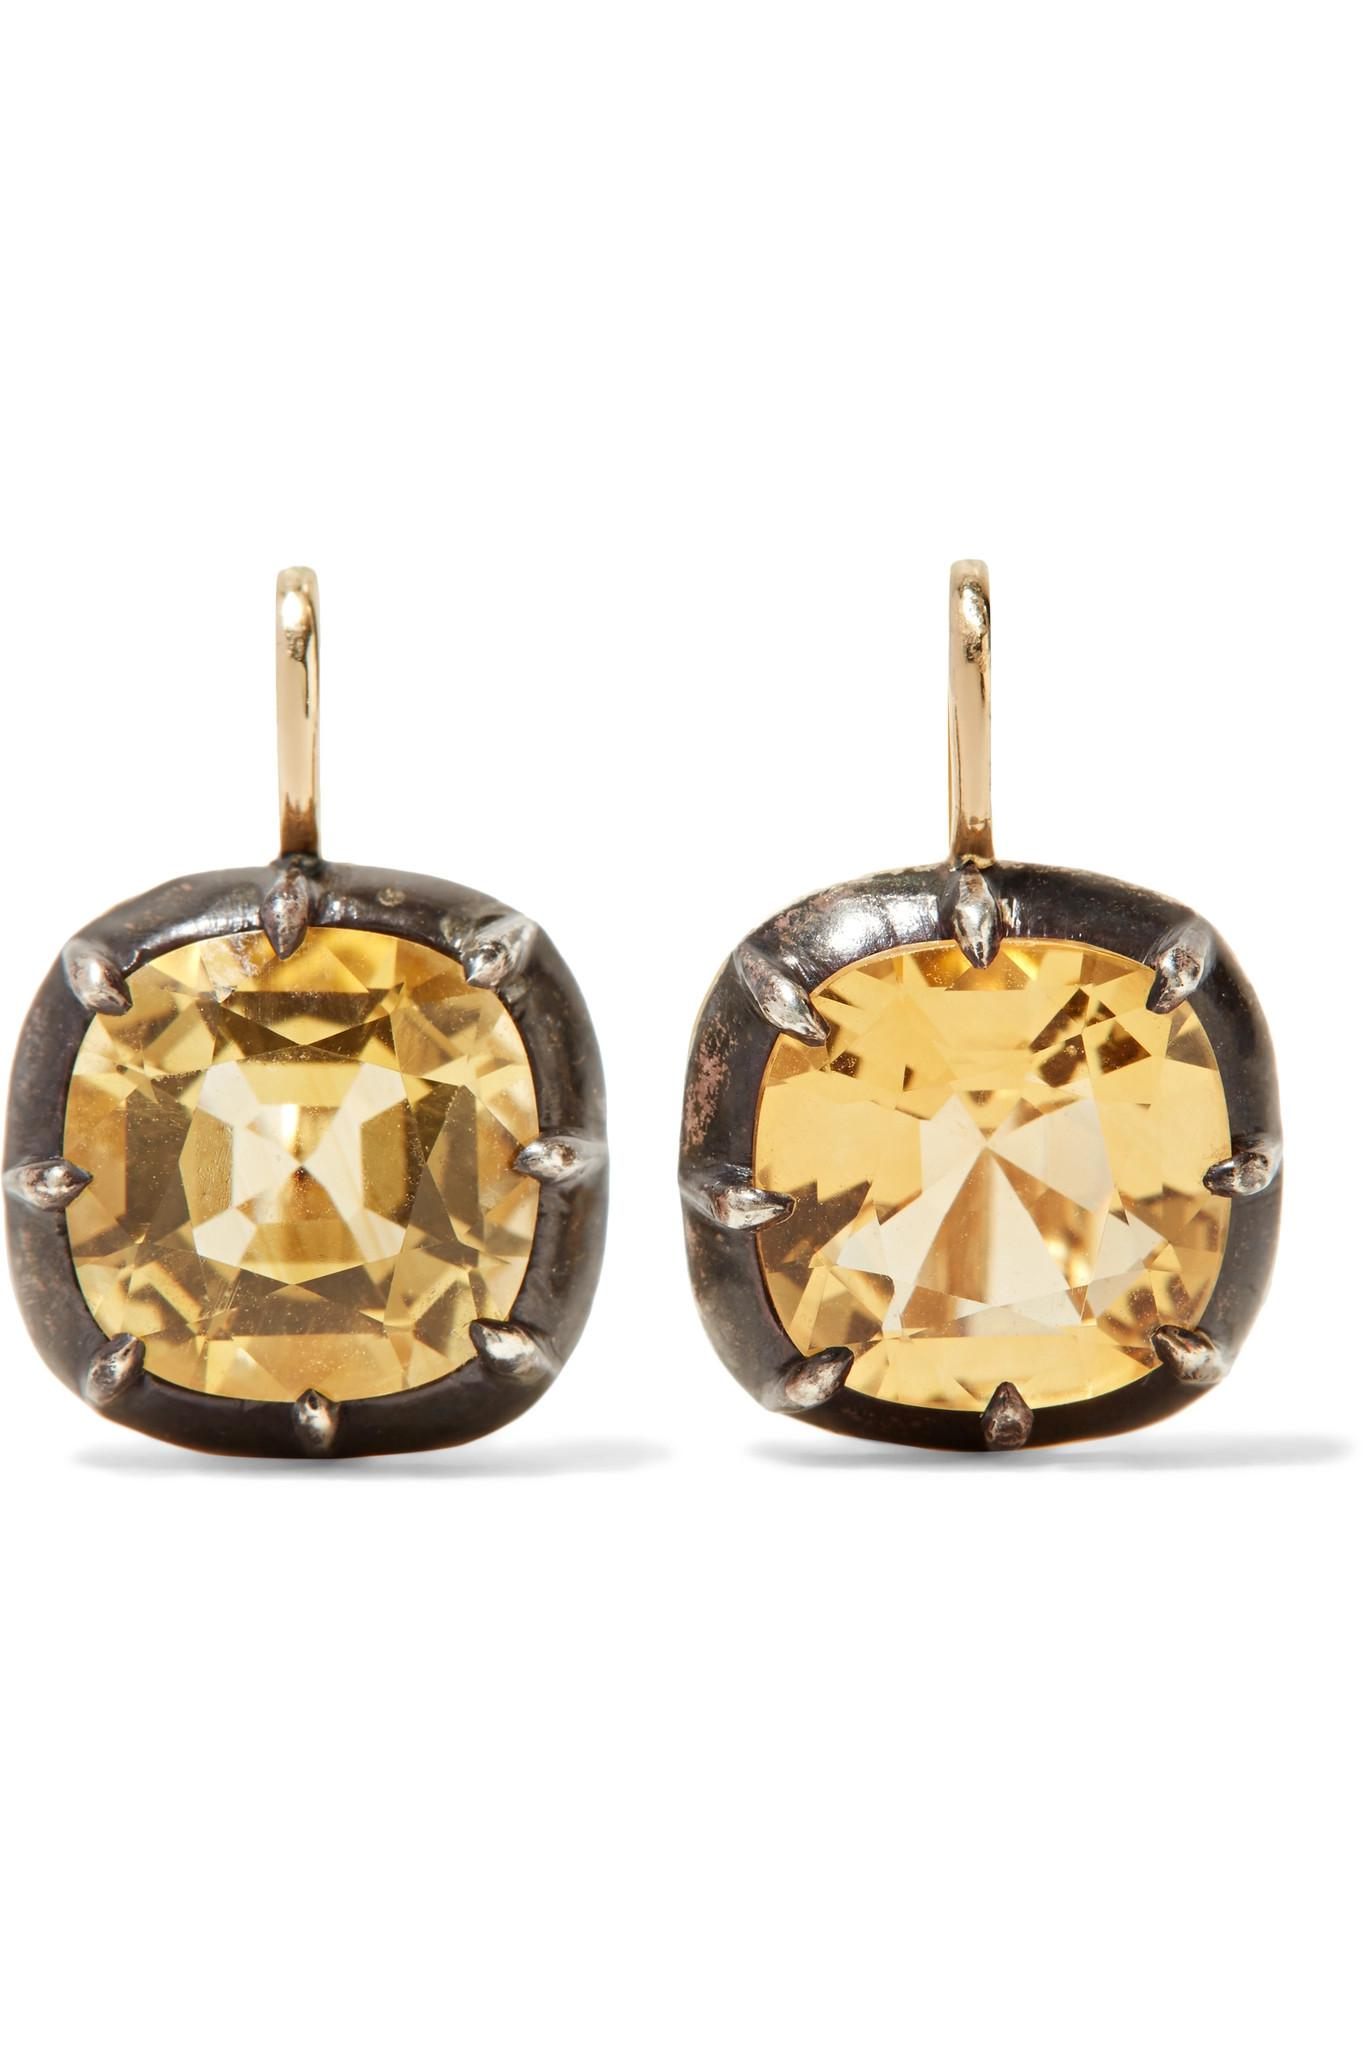 Collection Dard De Fleurs En Herbe 18 Carats Boucles D'oreilles En Diamant D'or - Taille Fred Leighton 3WVIU